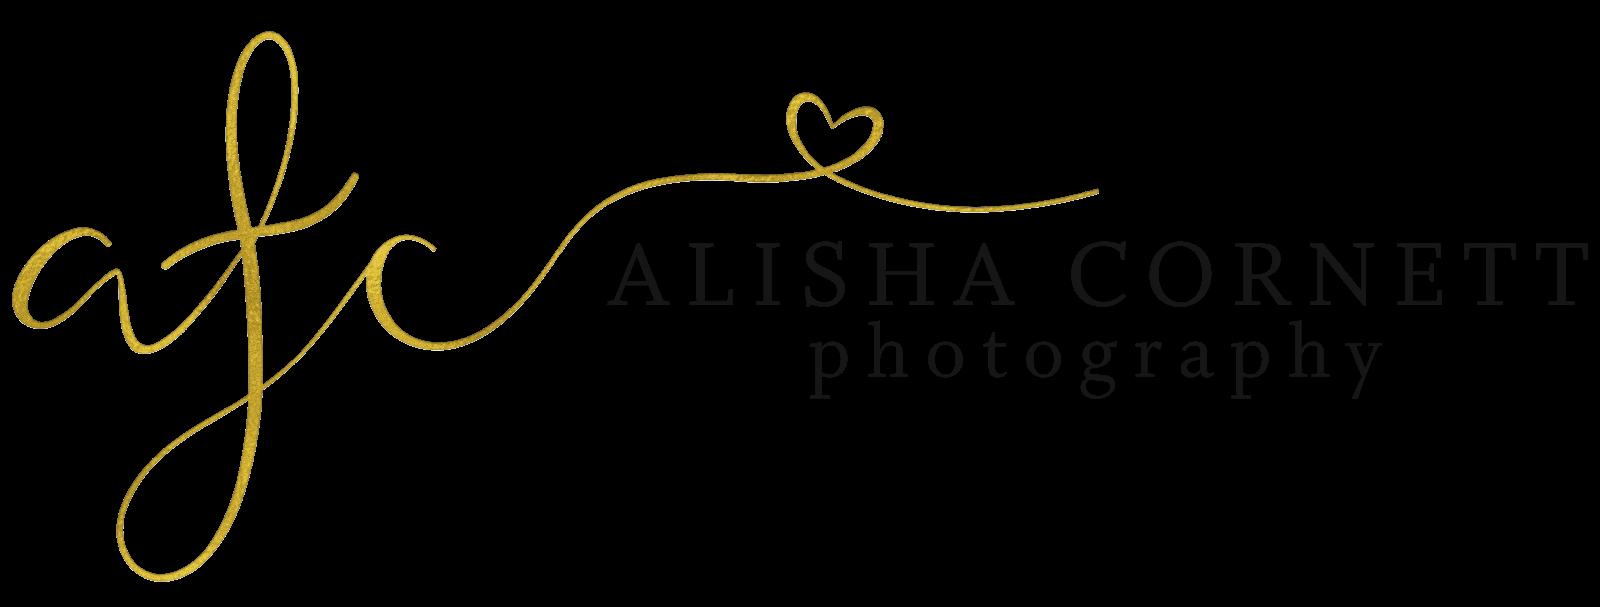 Alisha Cornett Photography